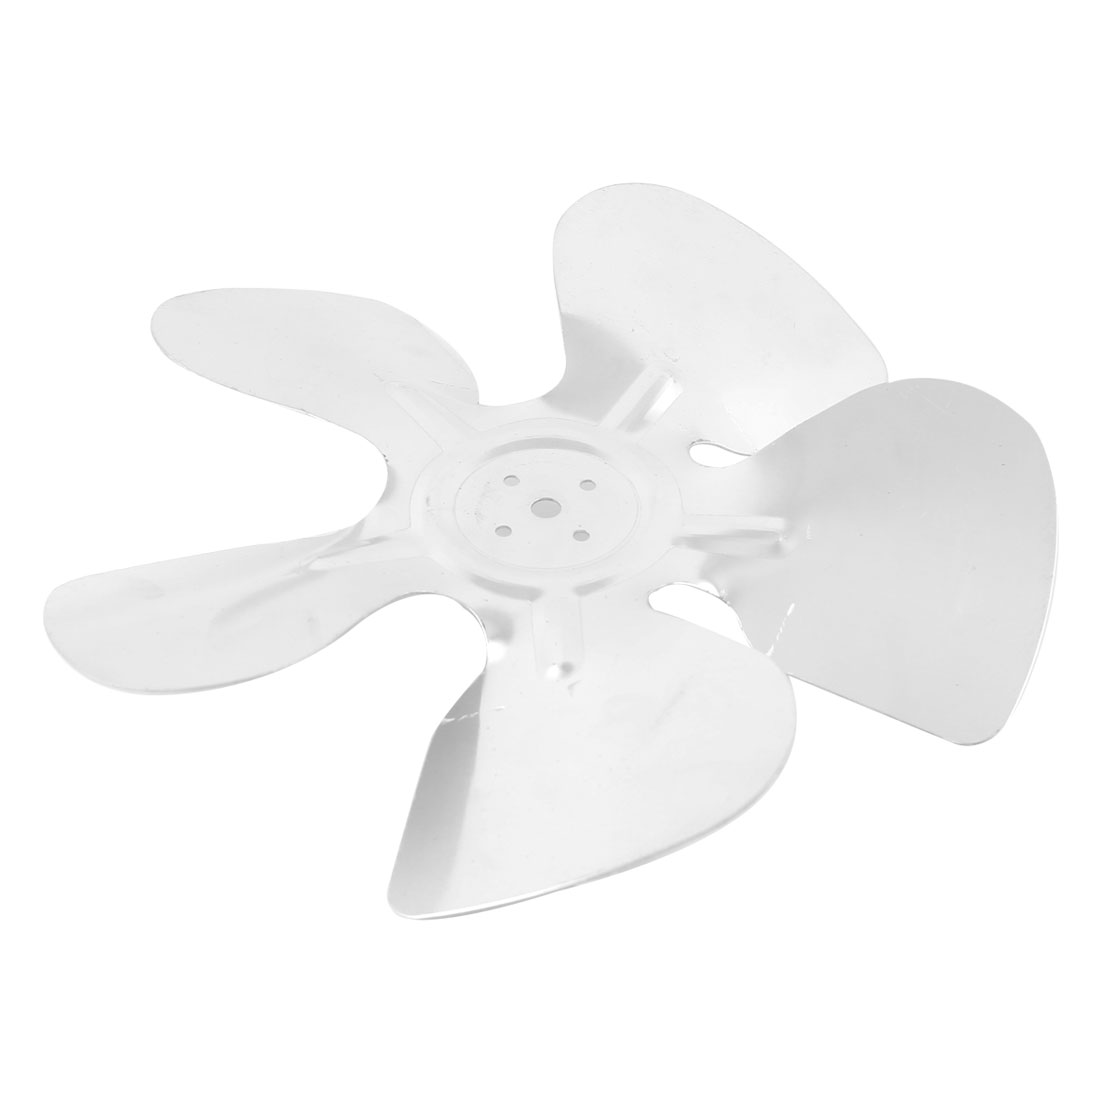 "Silver Tone Aluminum Alloy Refrigertor Exaust Motor Fan Vanes 9"" Diameter"